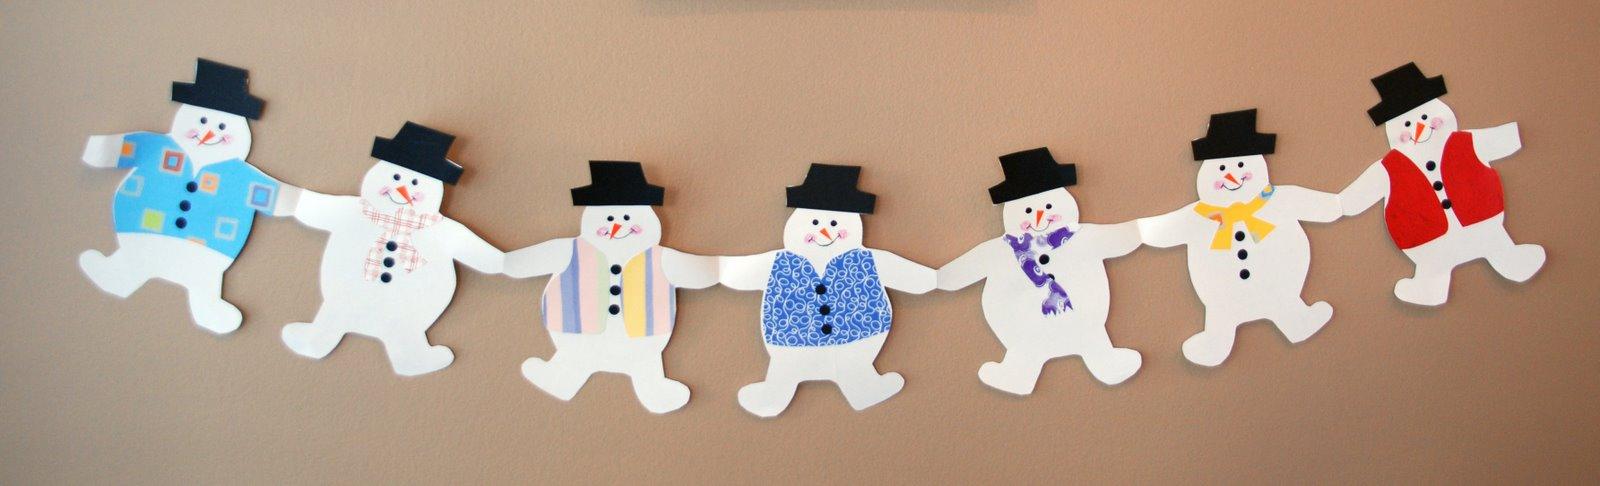 Гирлянды снеговики из бумаги своими руками